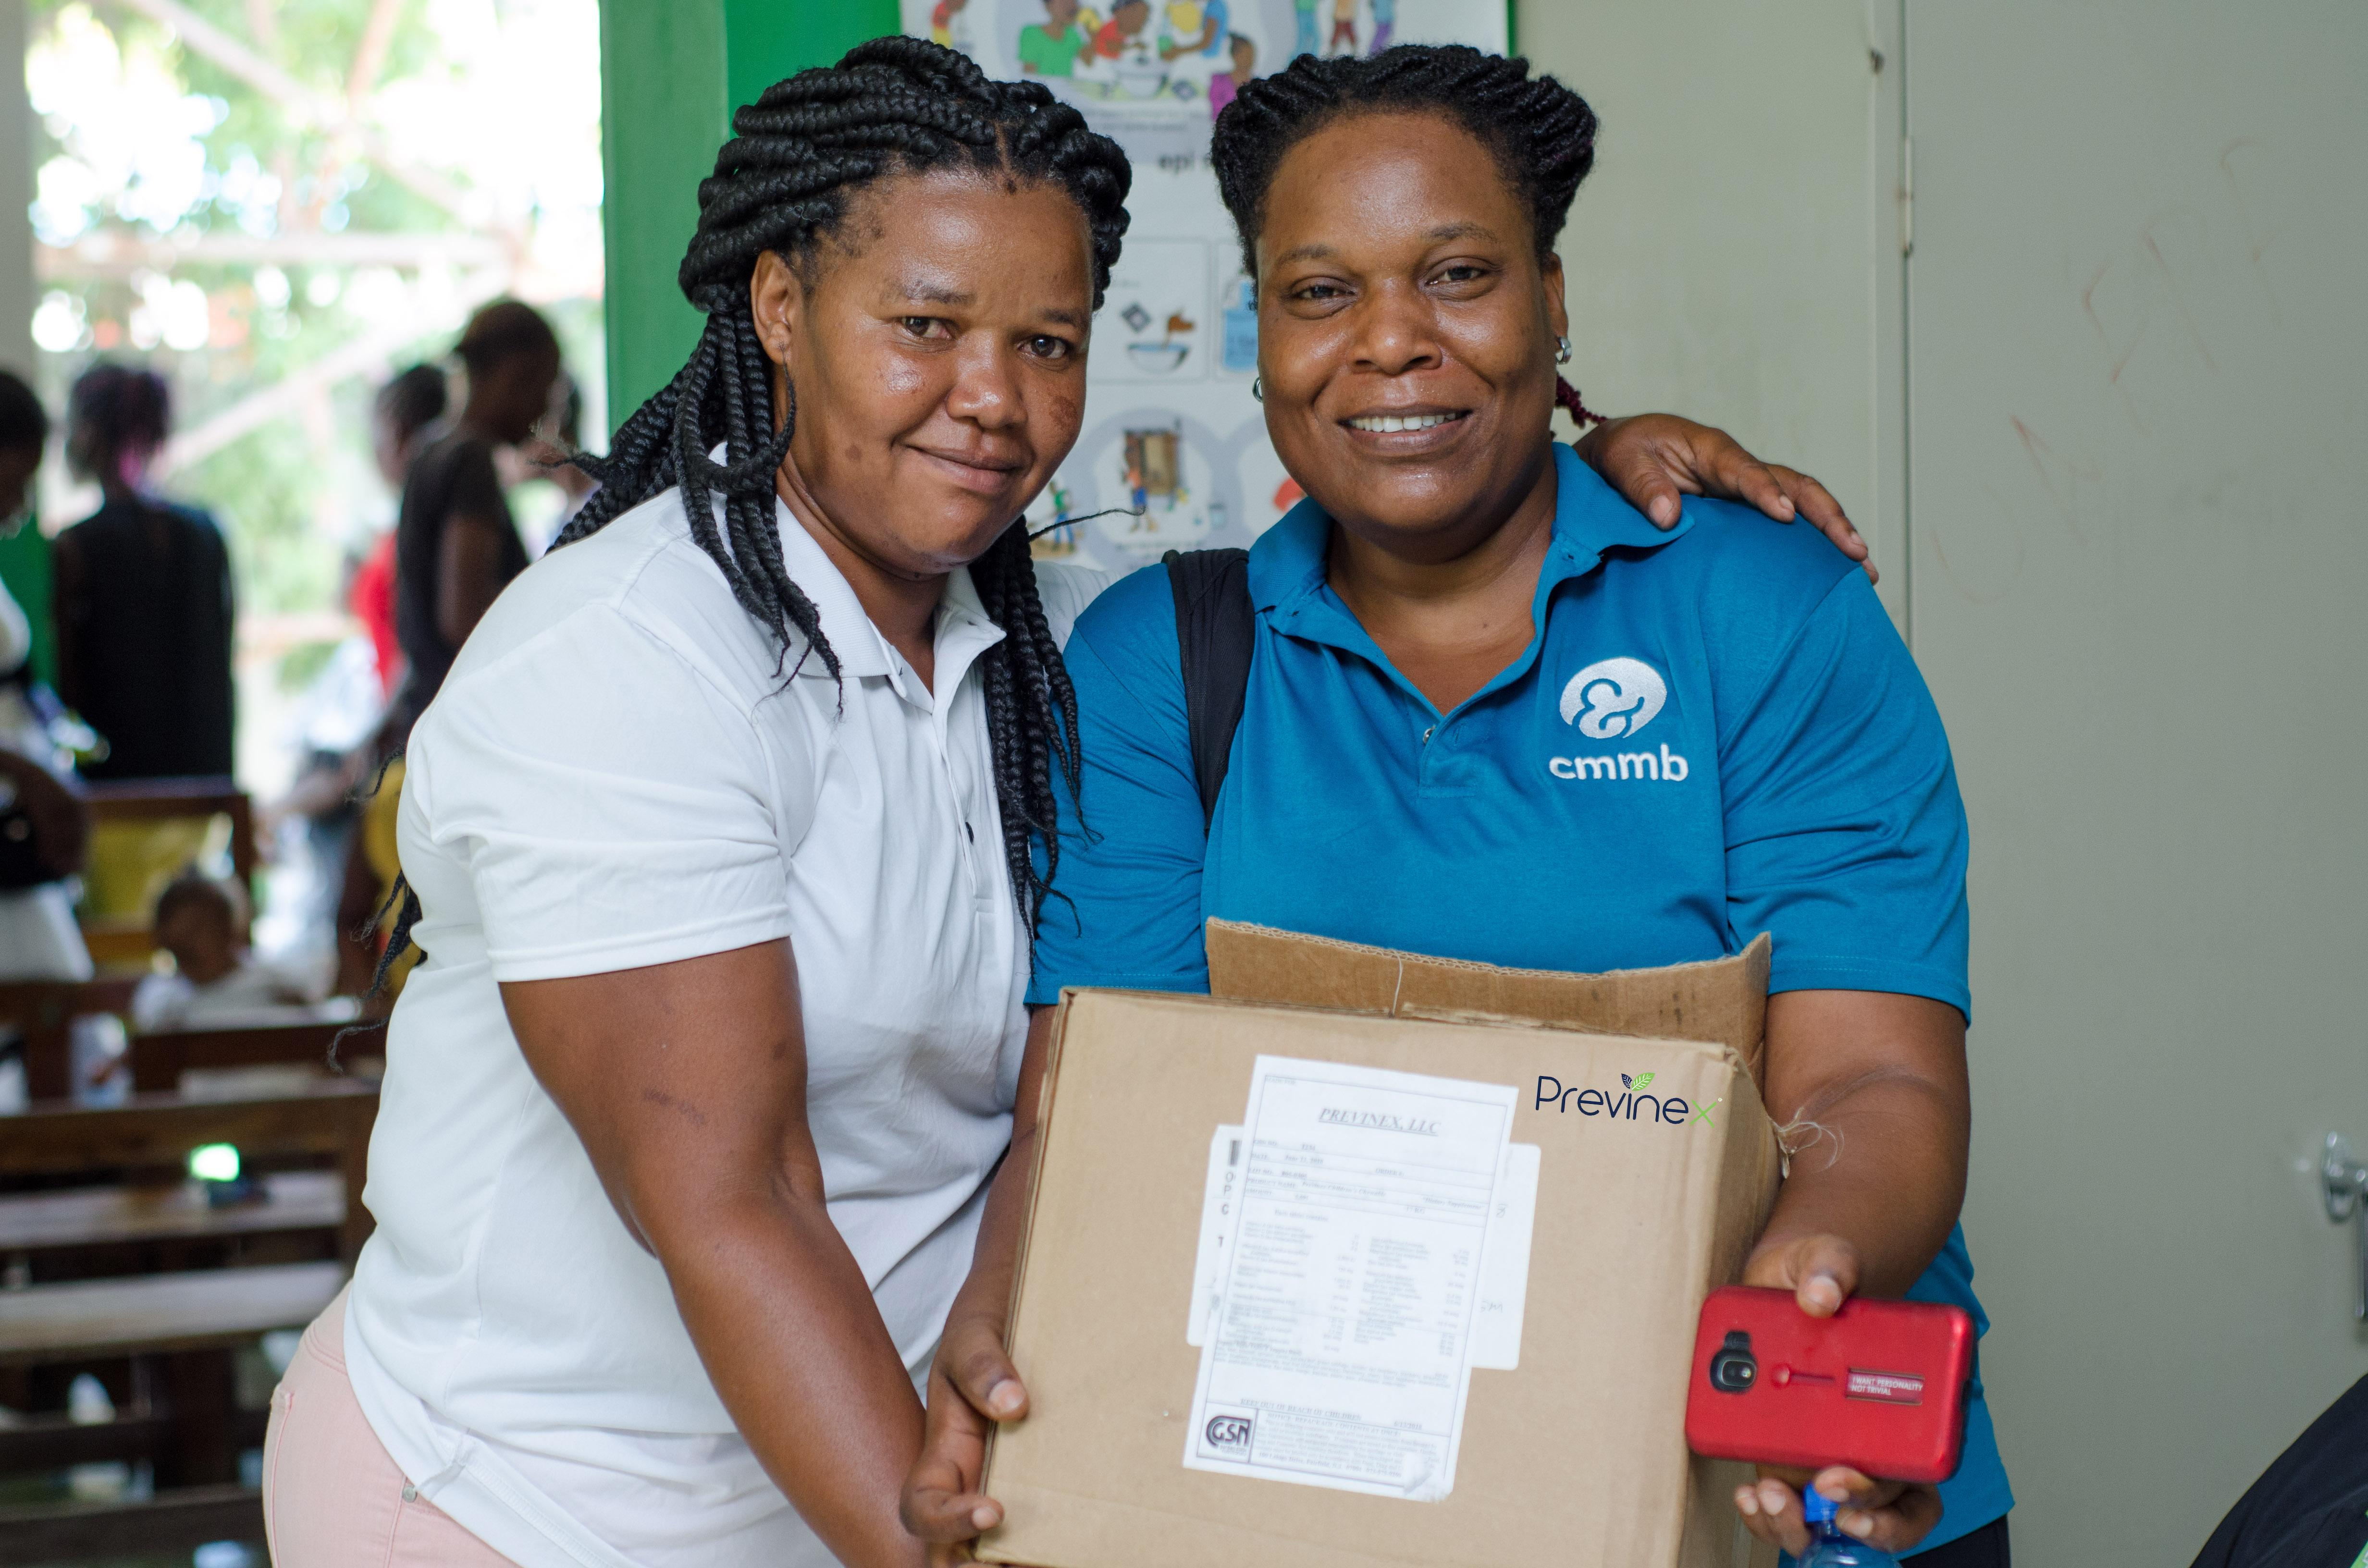 two nurses in haiti hold box with previnex vitamins